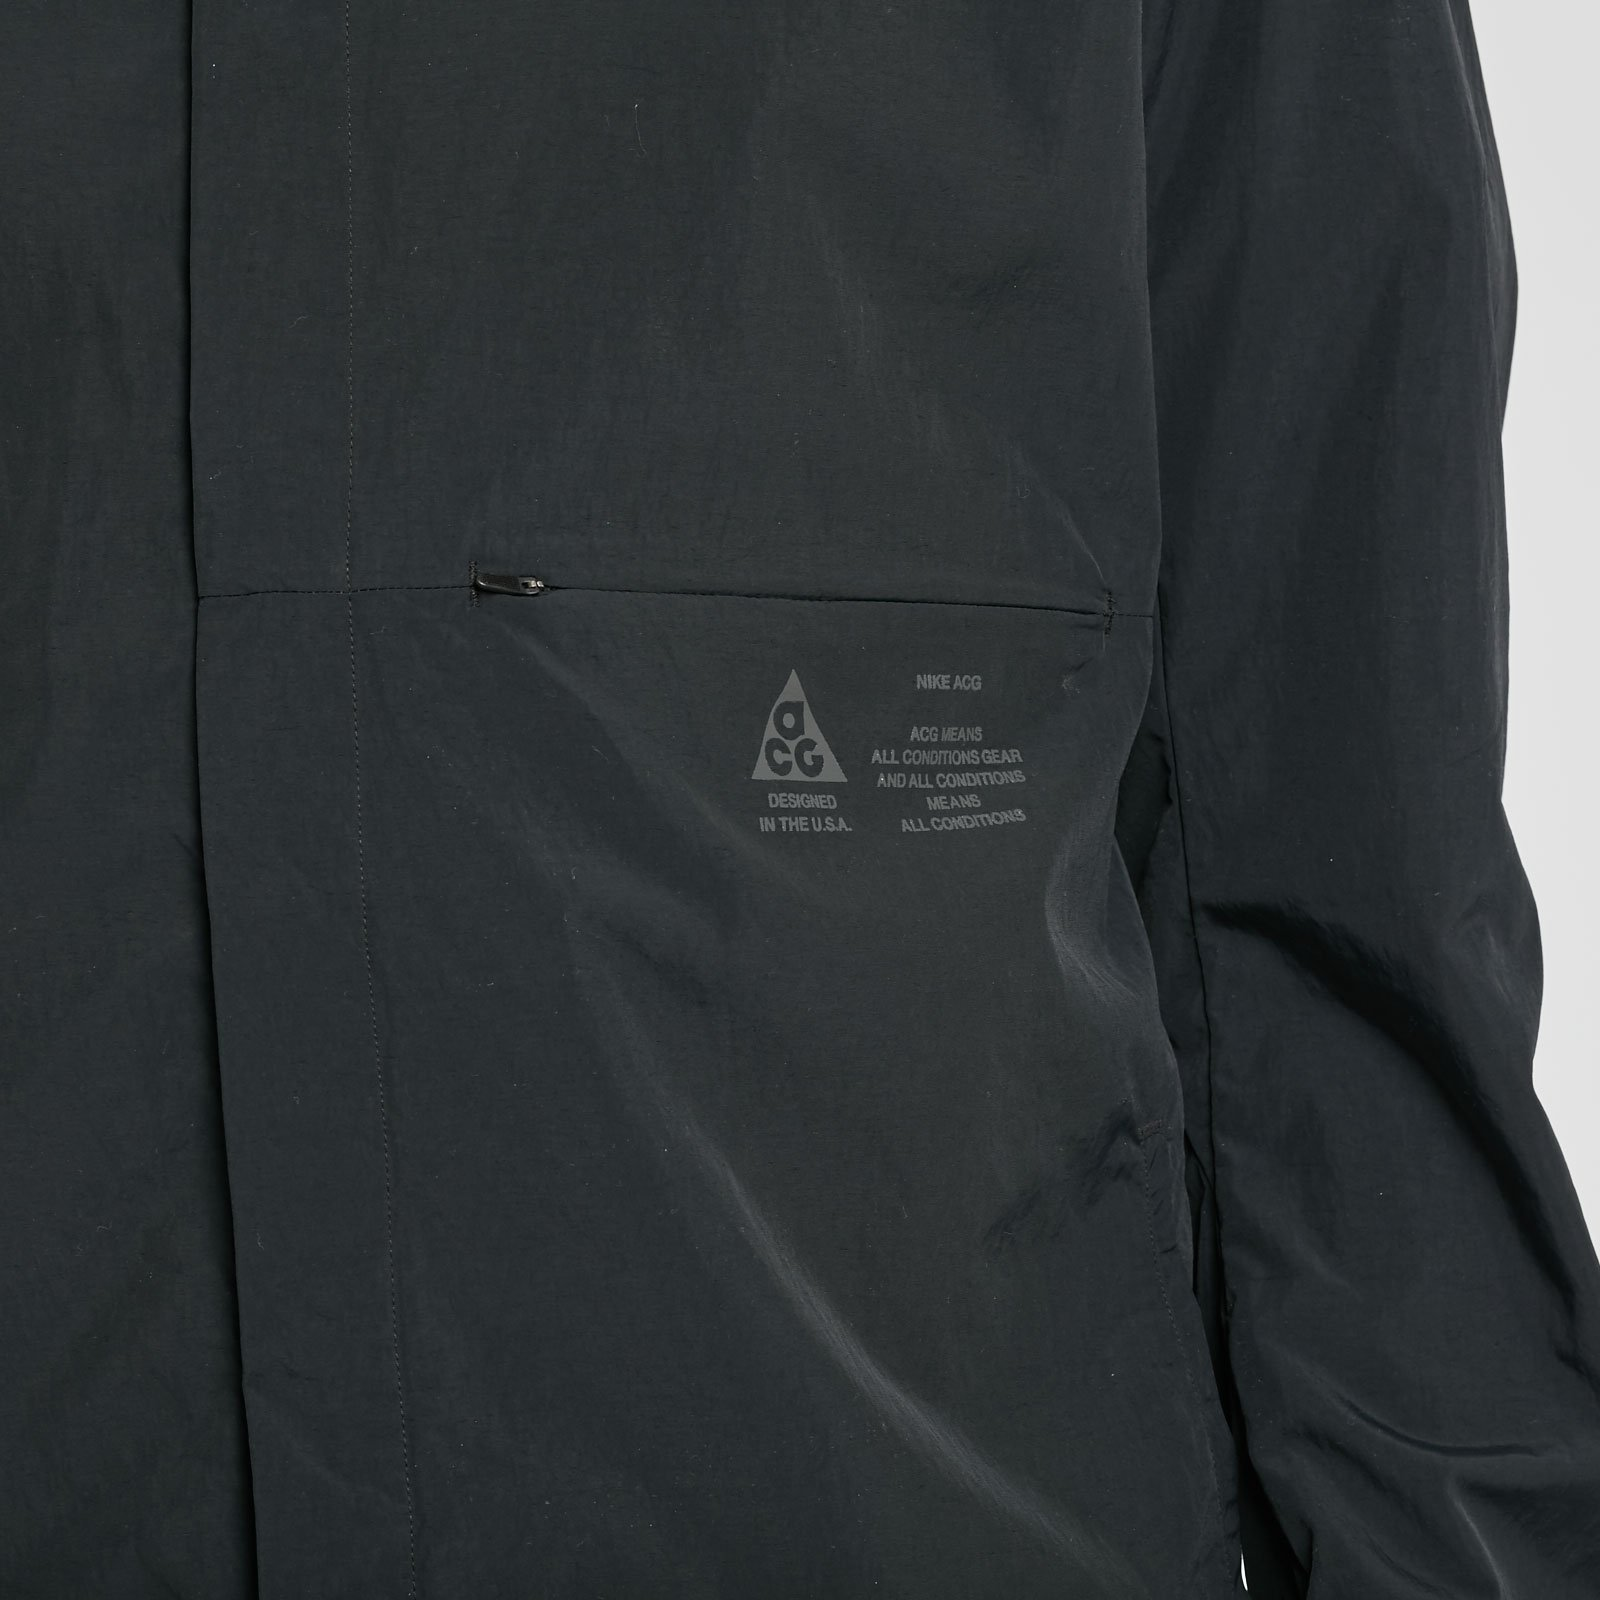 a7c1915bd2dc Nike ACG Shirt Jacket - 880977-010 - Sneakersnstuff